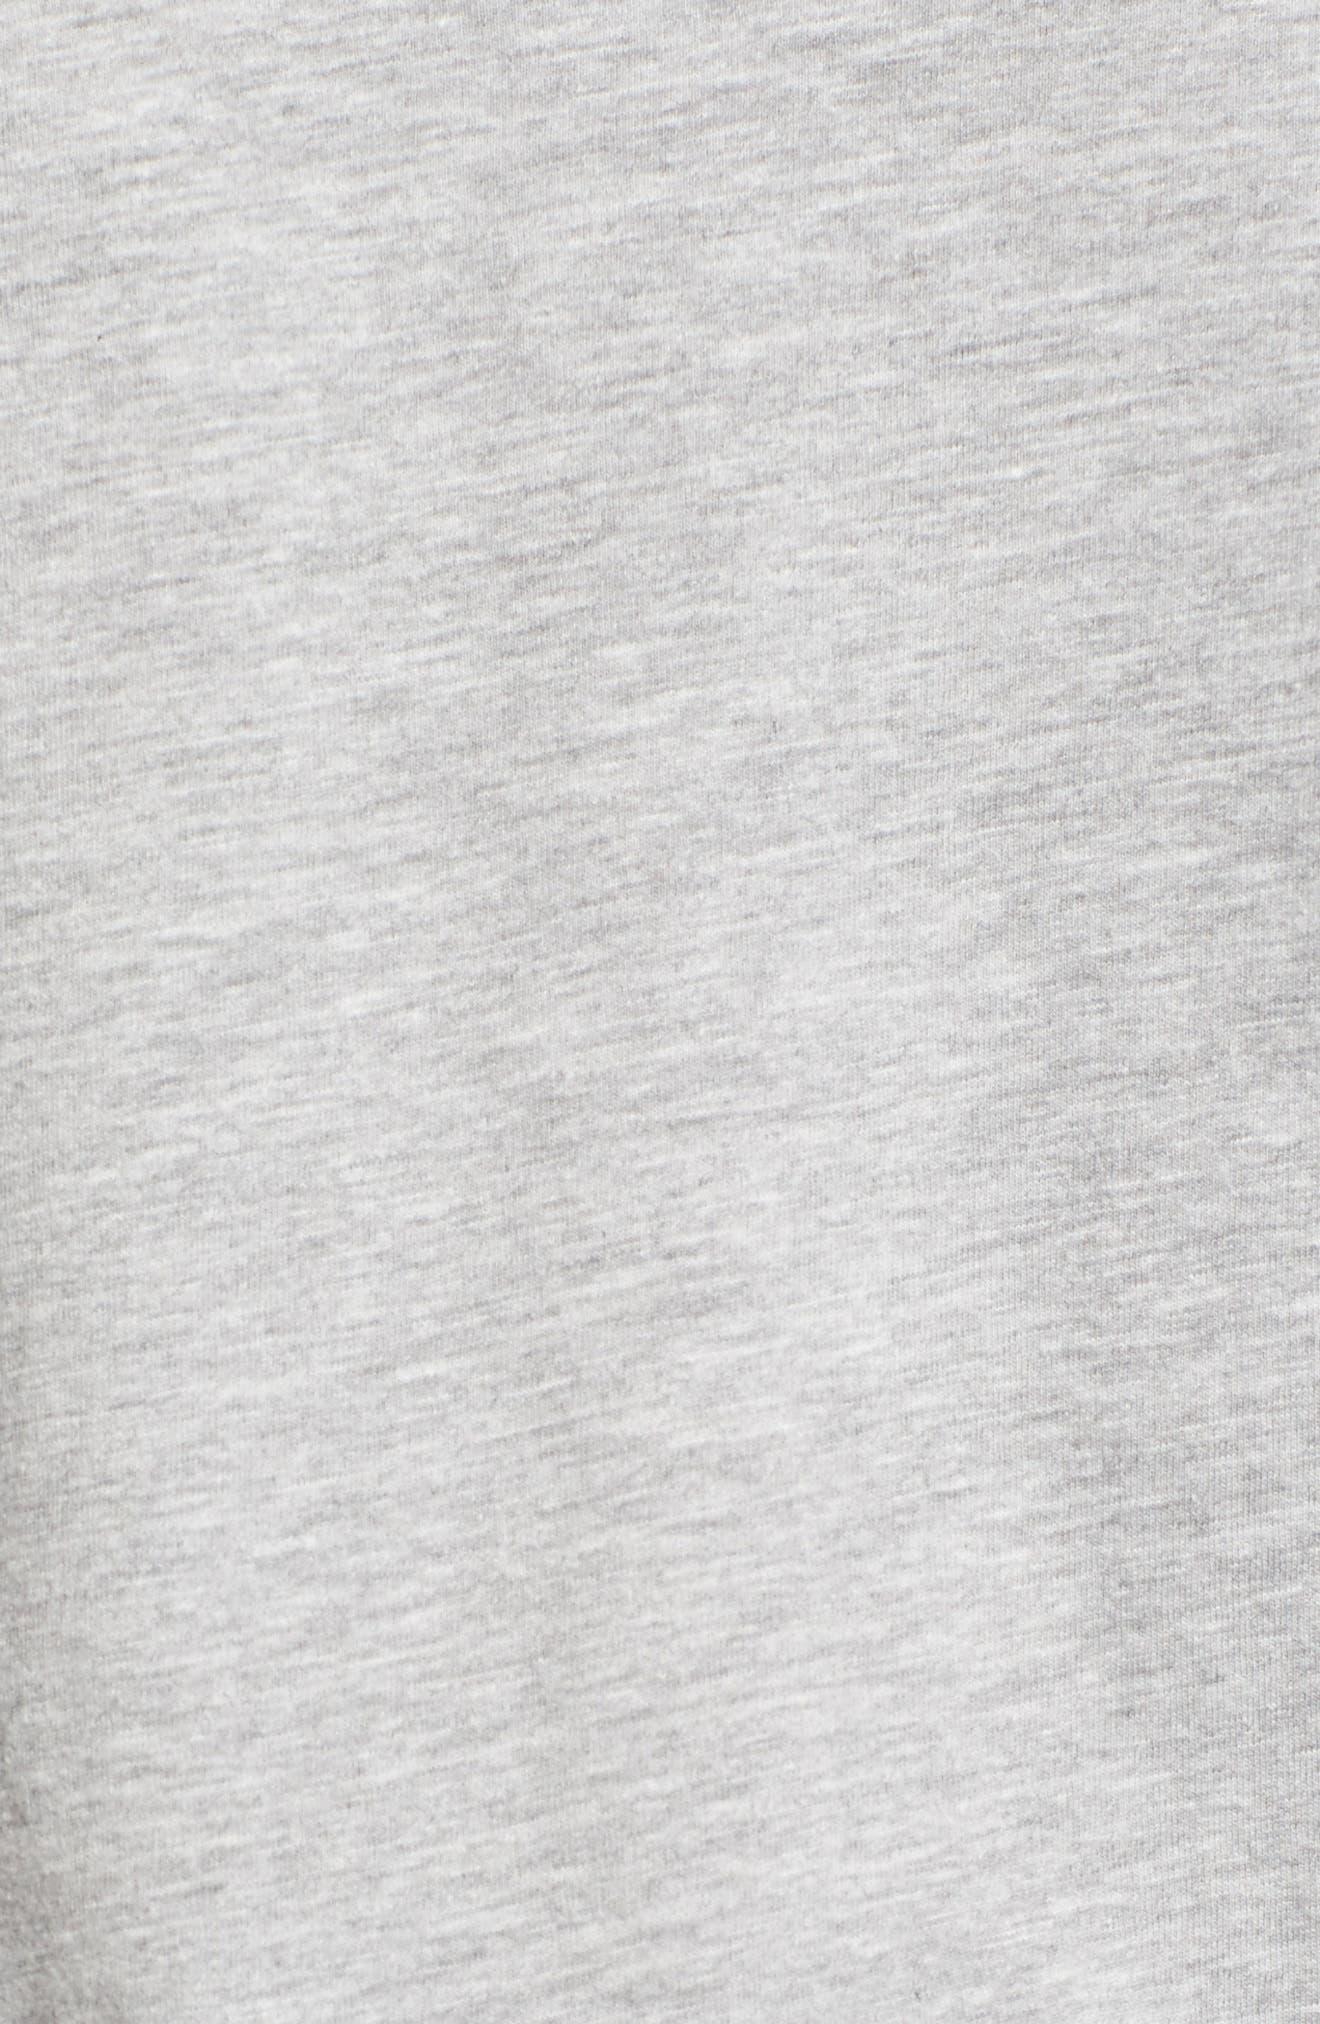 Varsity Stripe Tee,                             Alternate thumbnail 5, color,                             Grey Heather- White Combo